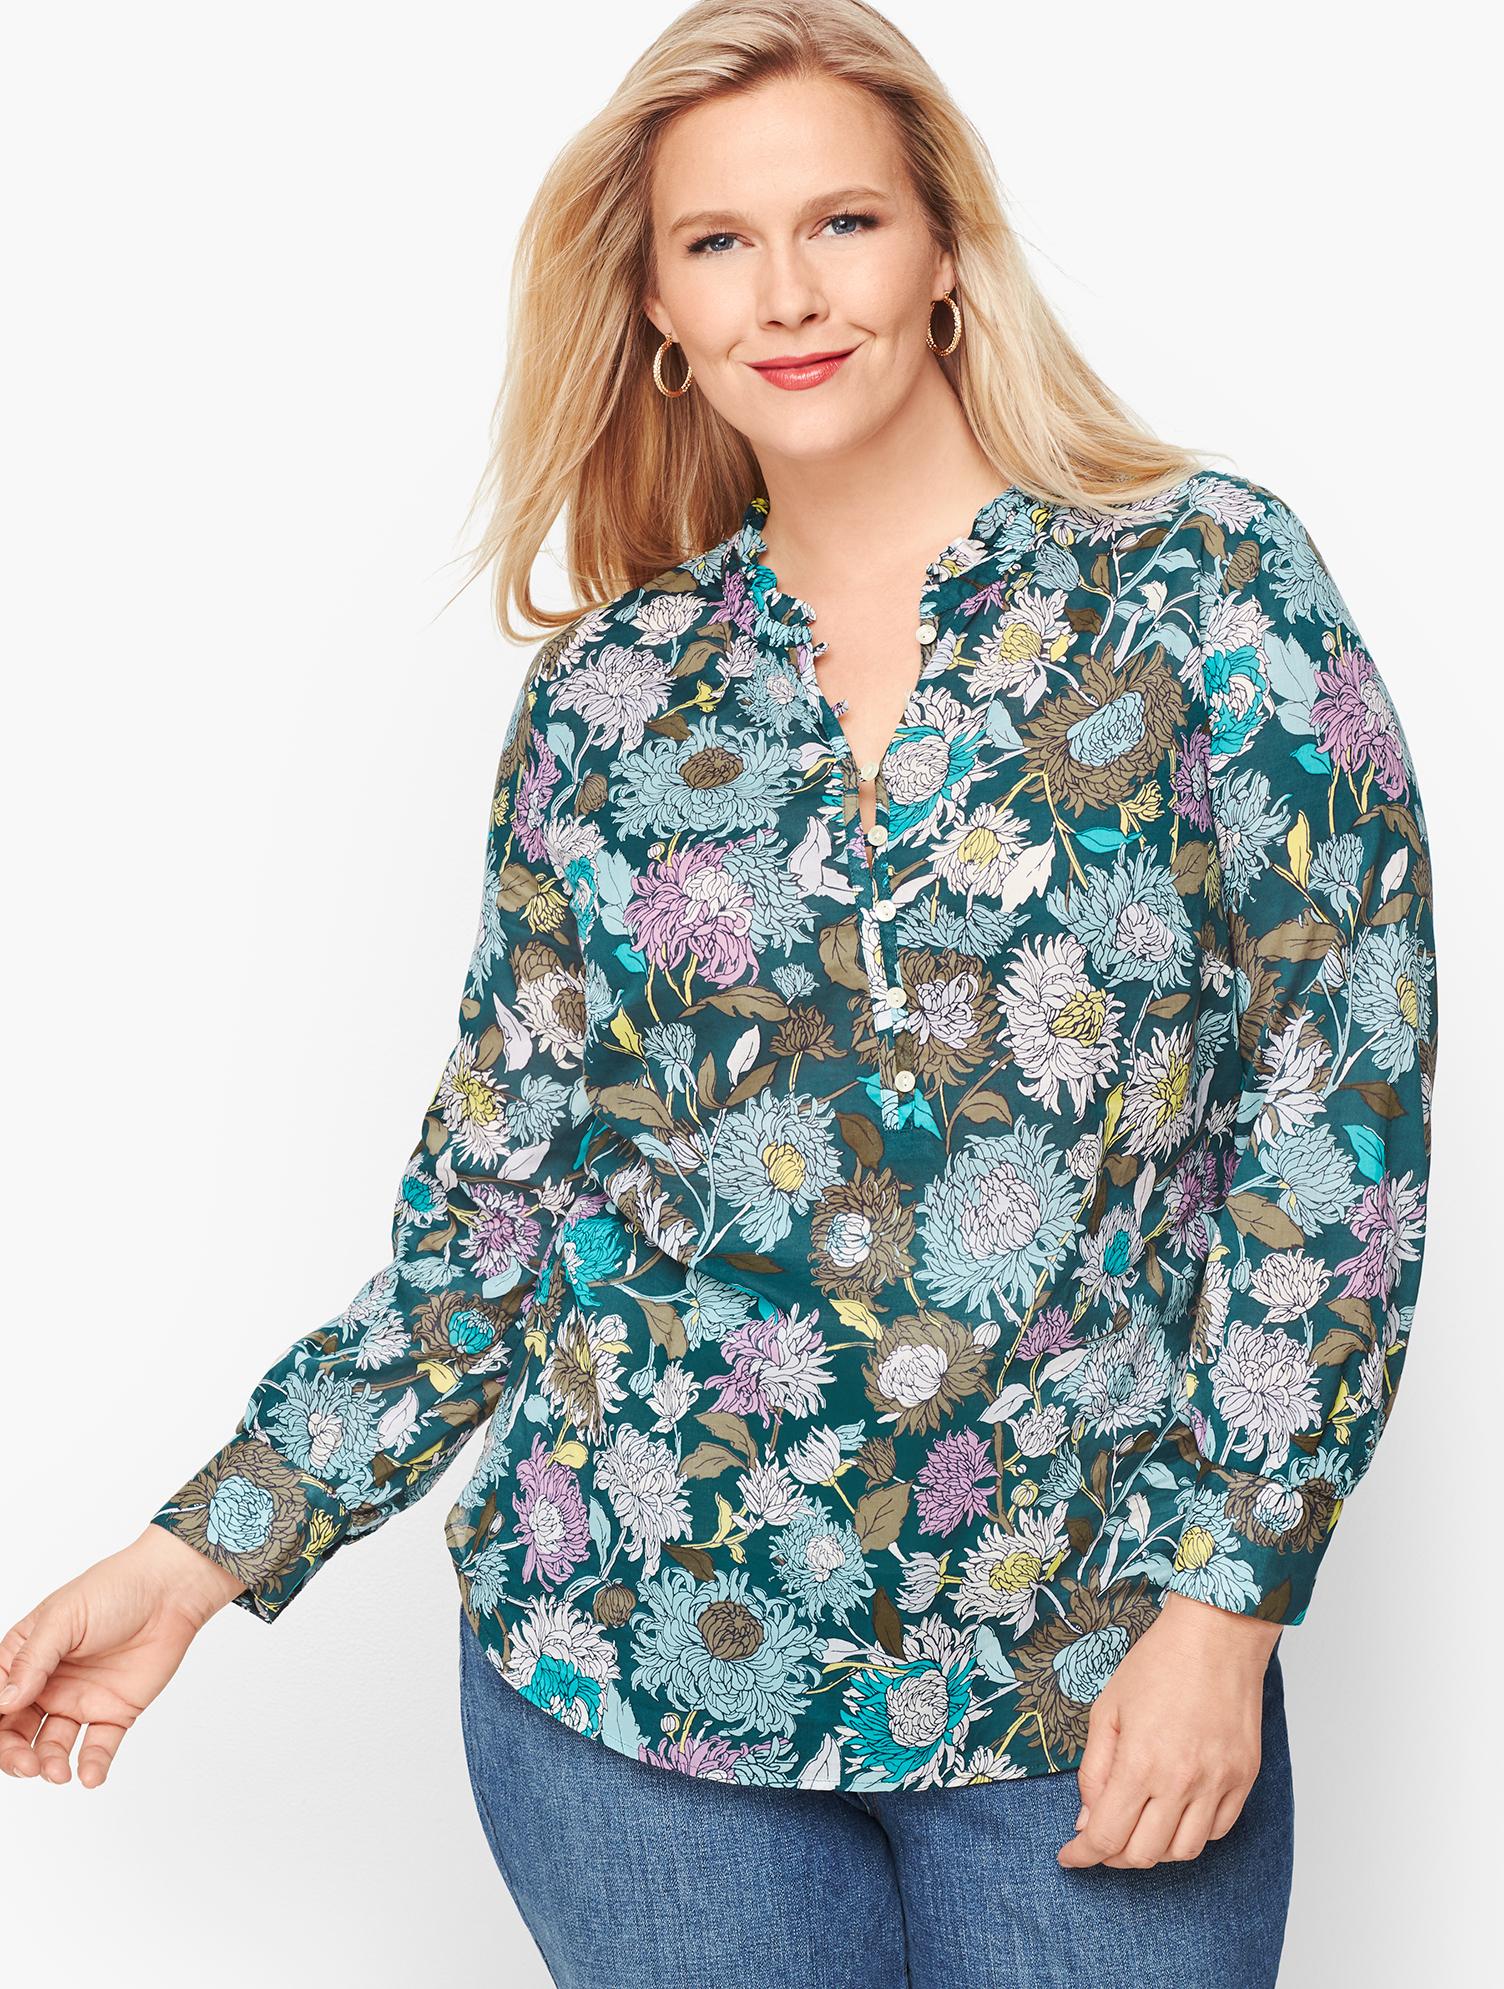 Women's 70s Shirts, Blouses, Hippie Tops Feminine Floral Popover - TWILIGHT-TEAL - 3X - Talbots $67.12 AT vintagedancer.com